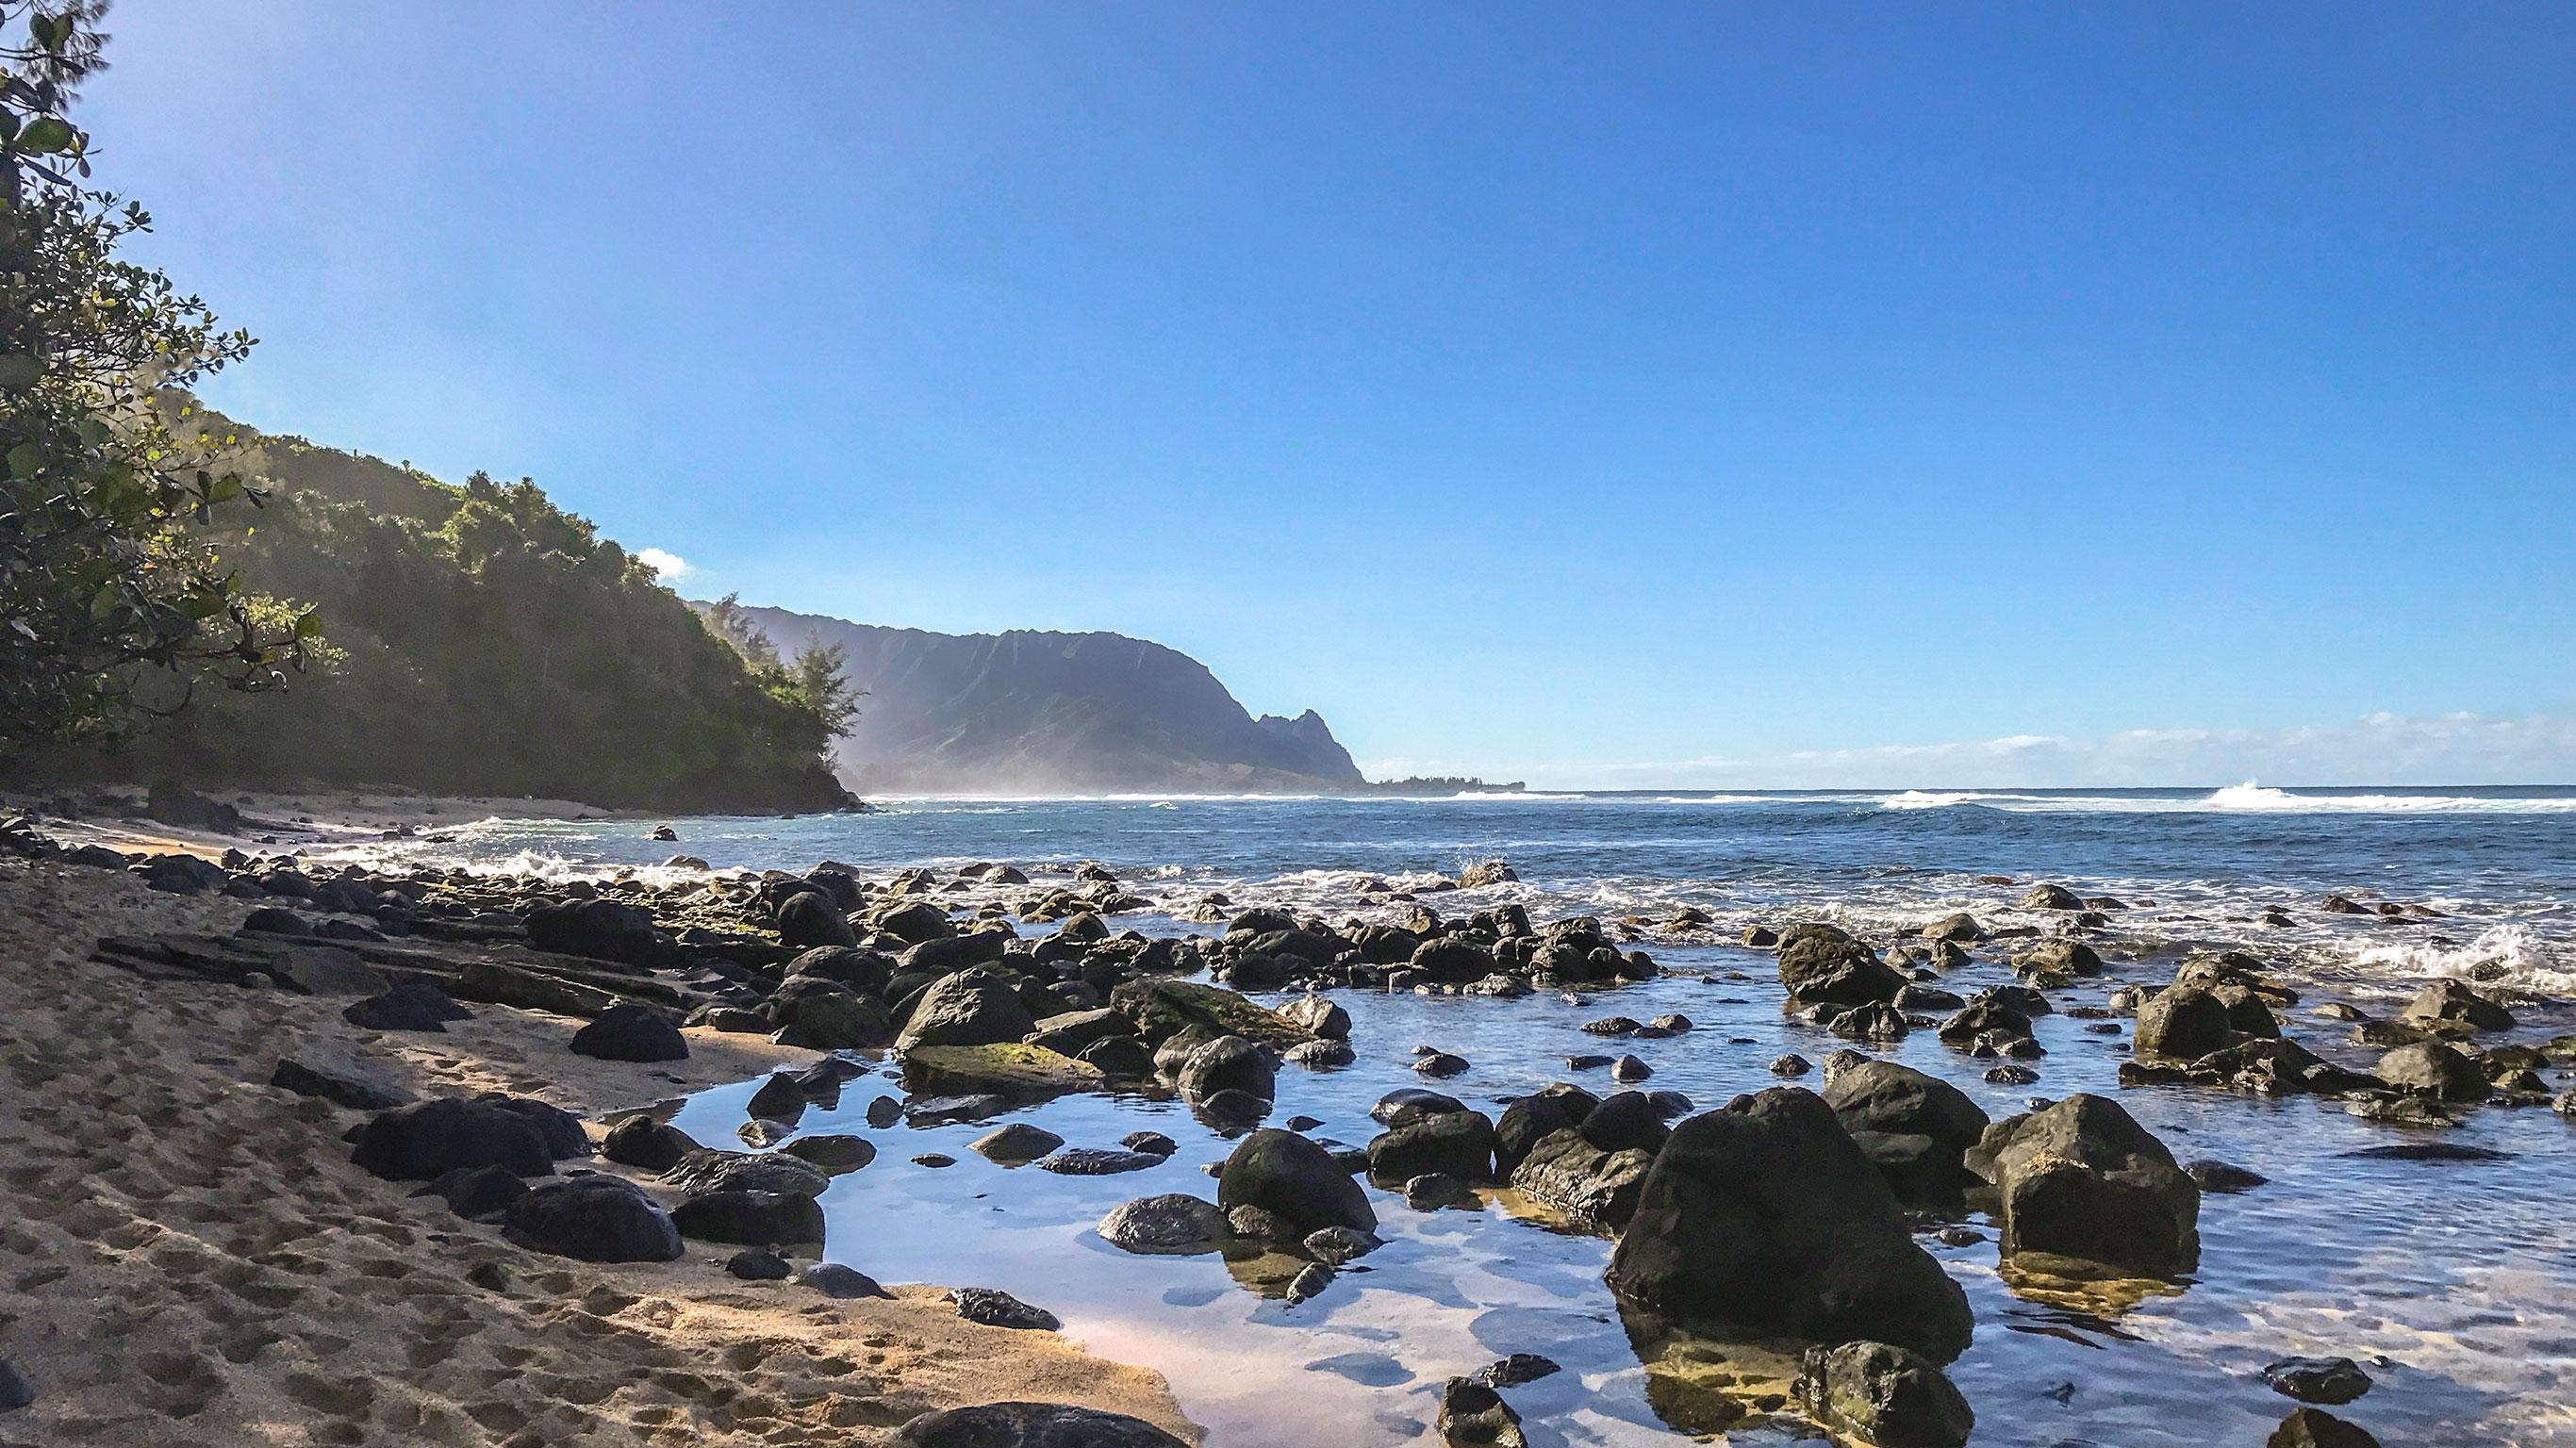 Erlebnisreise auf Oahu und Maui